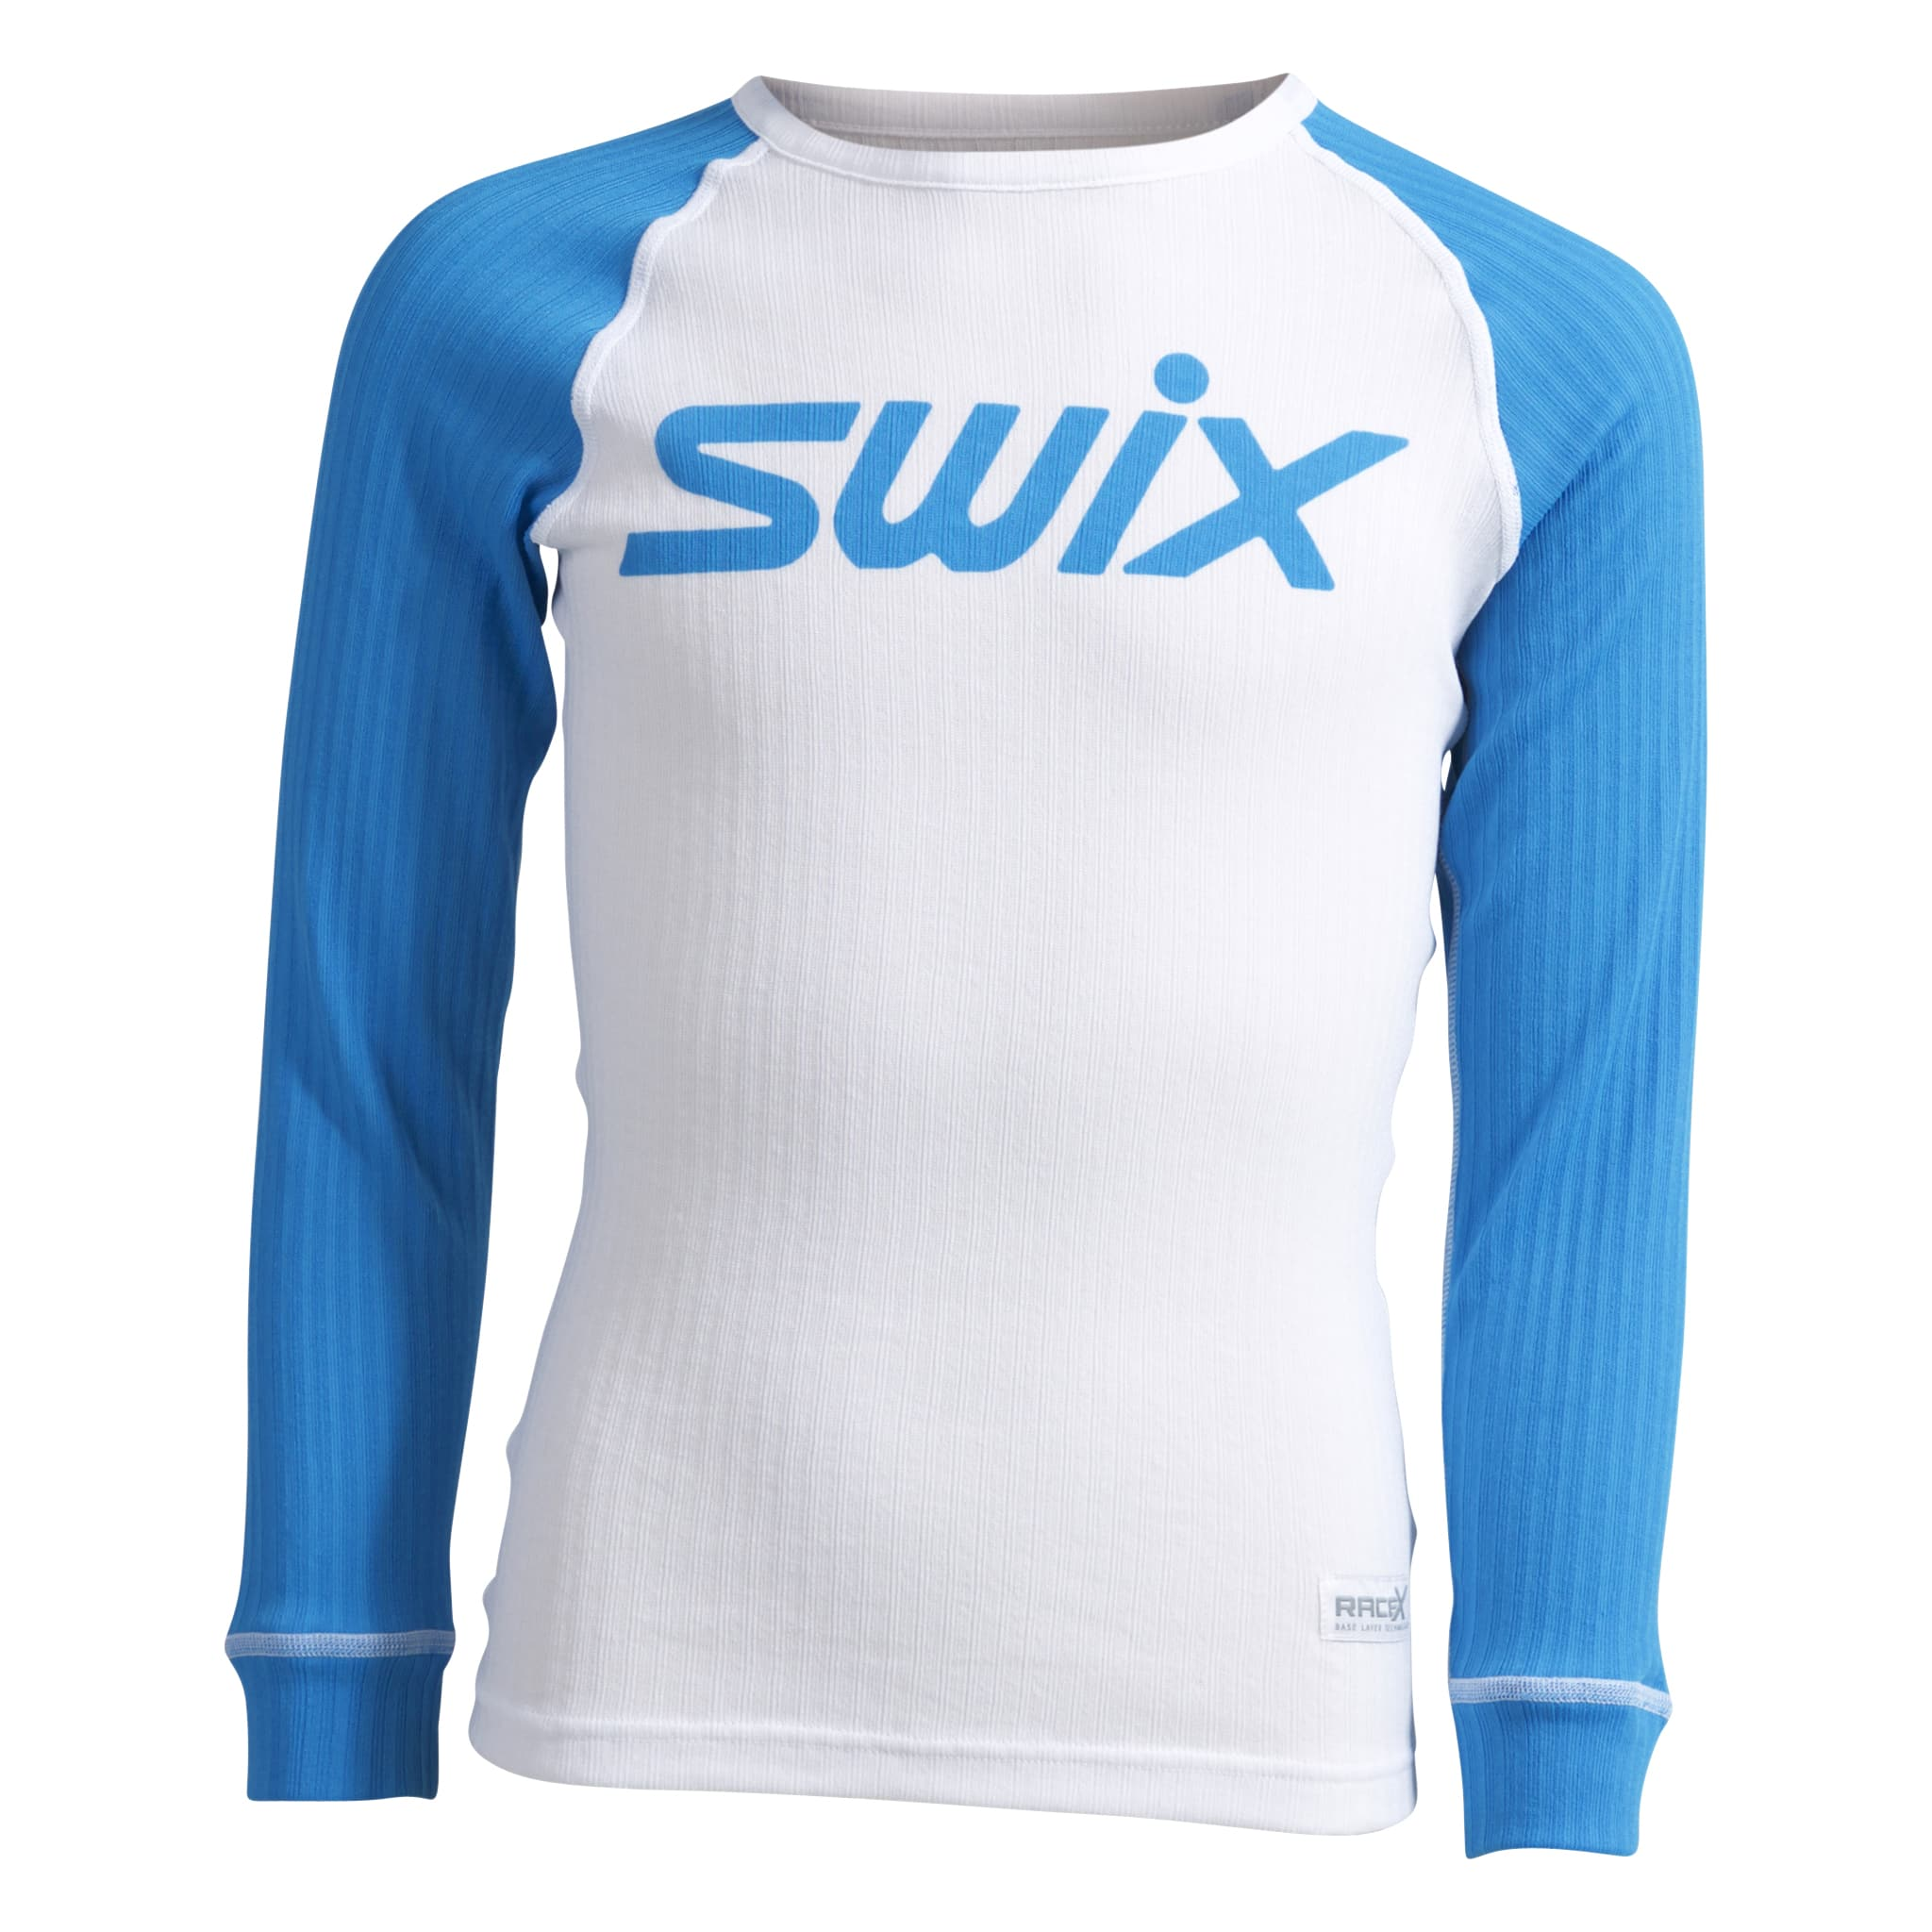 RaceX bodywear LS Junior